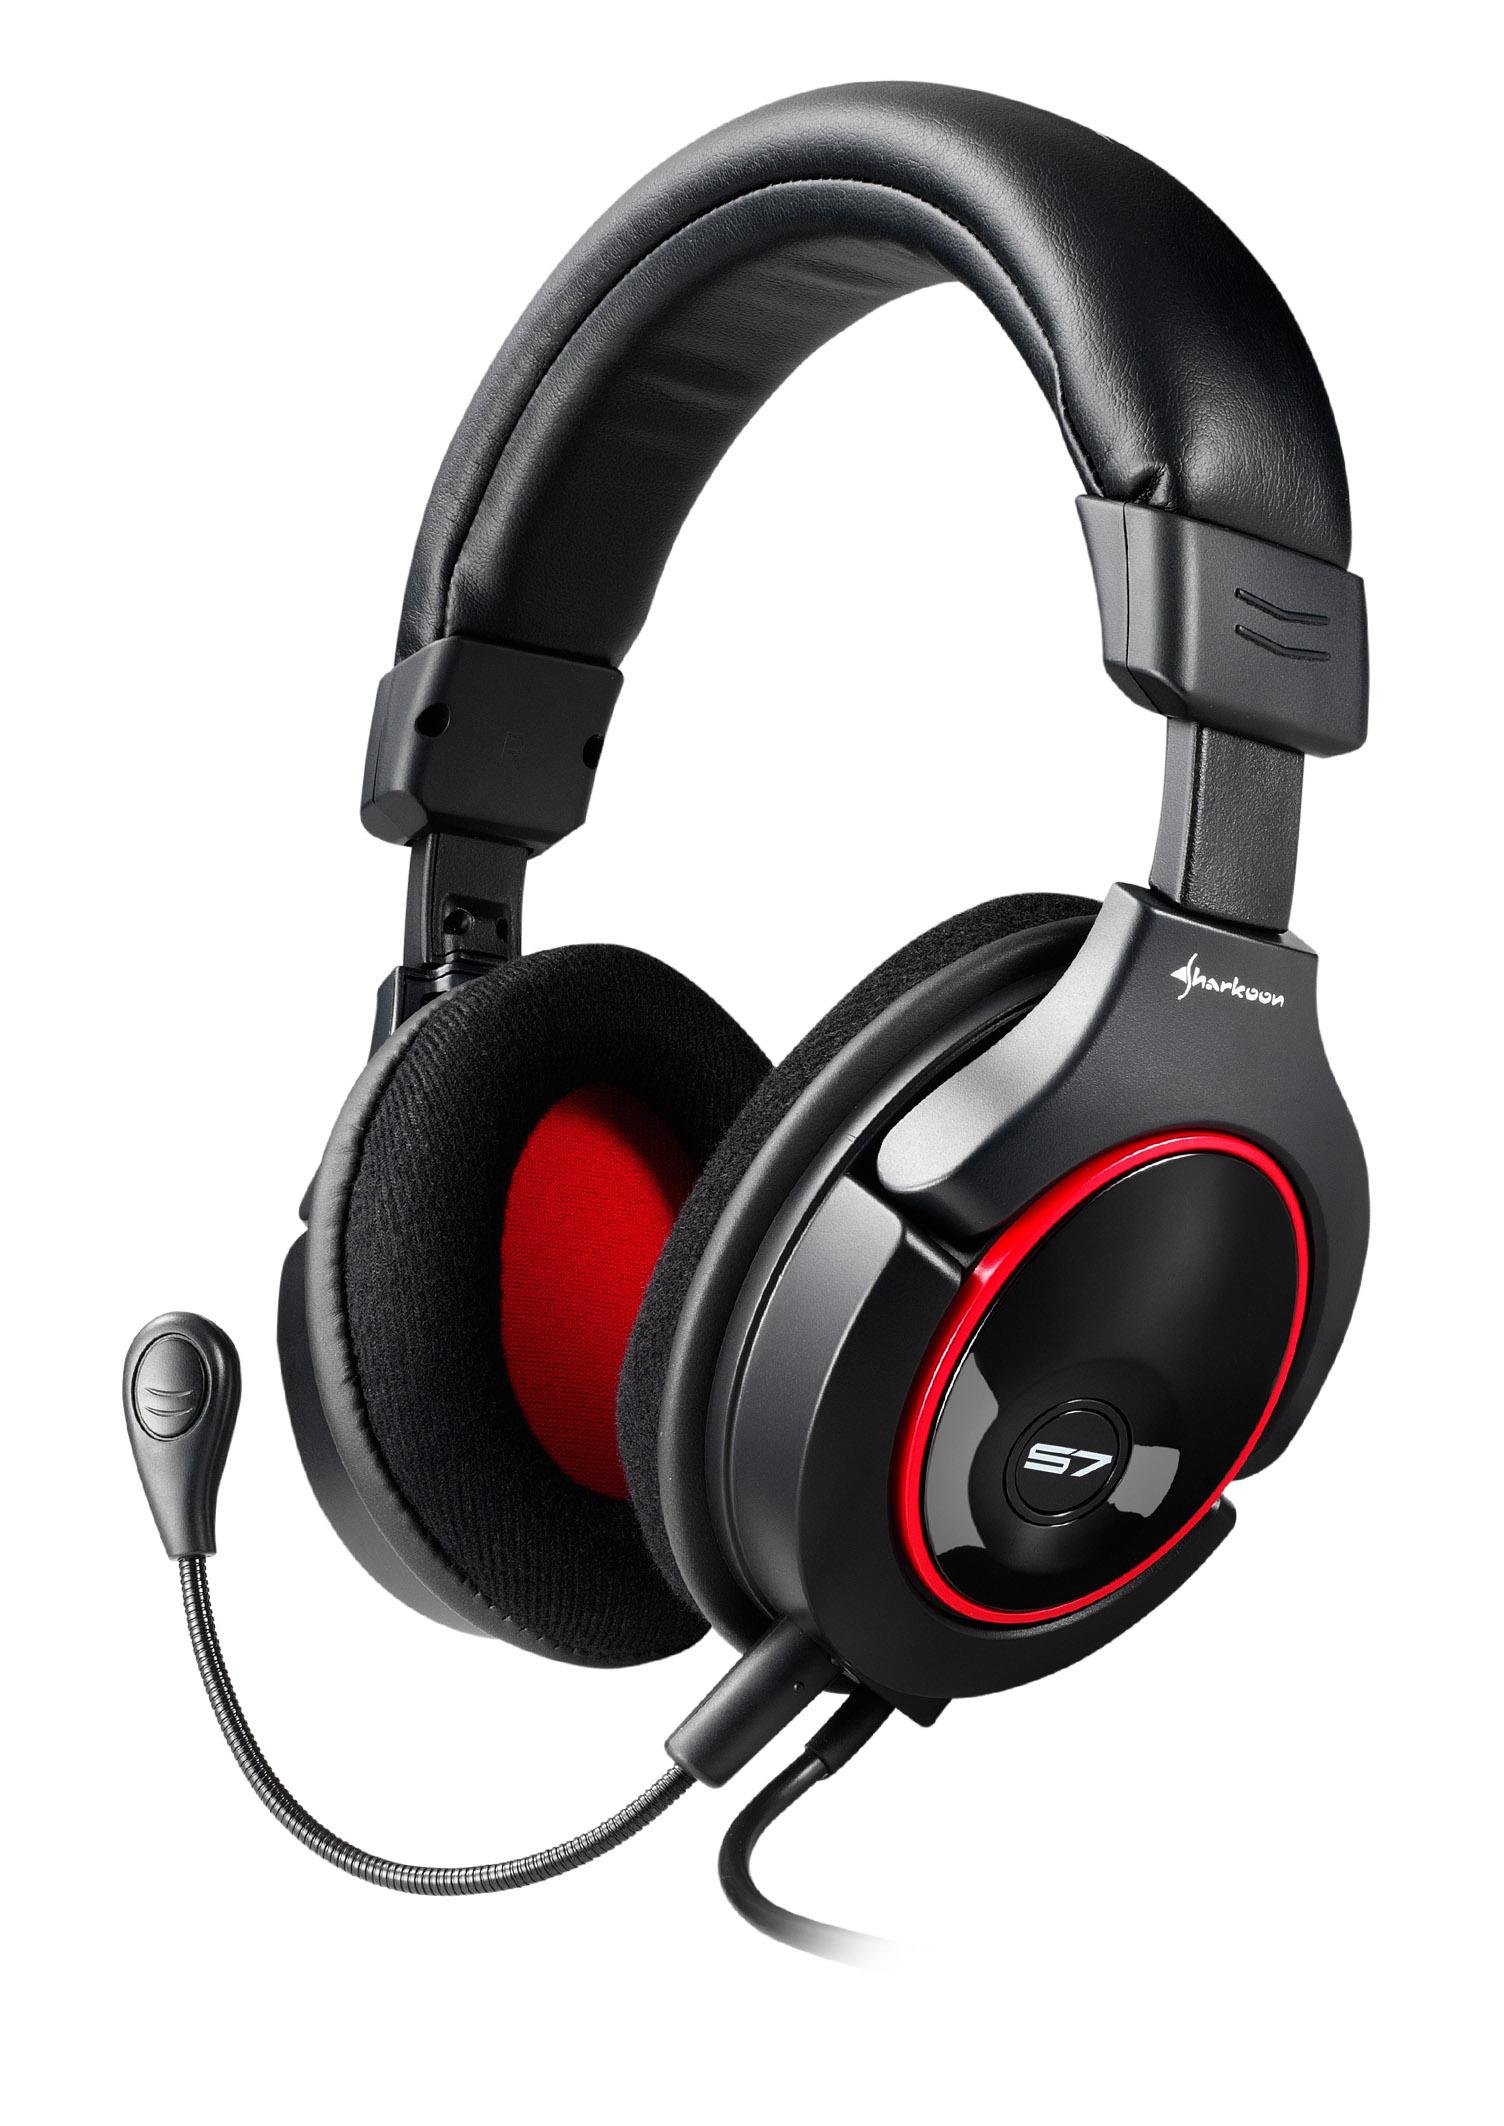 Sharkoon lanza los auriculares X-Tatic S7 con Dolby Pro Logic II